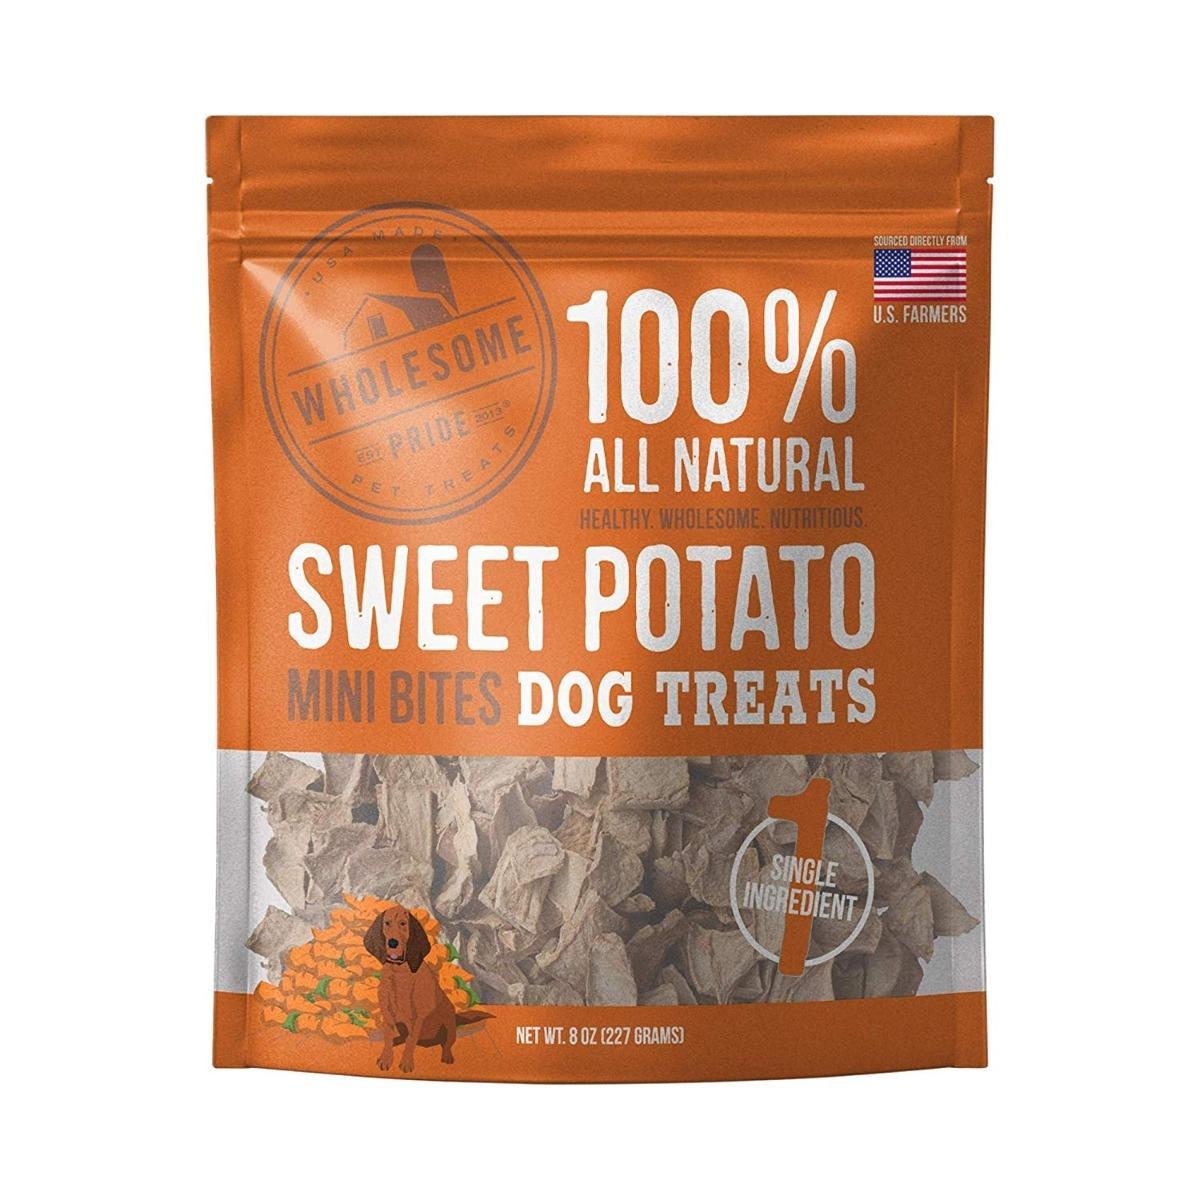 Wholesome Pride Mini Bites Dog Treats - Sweet Potato